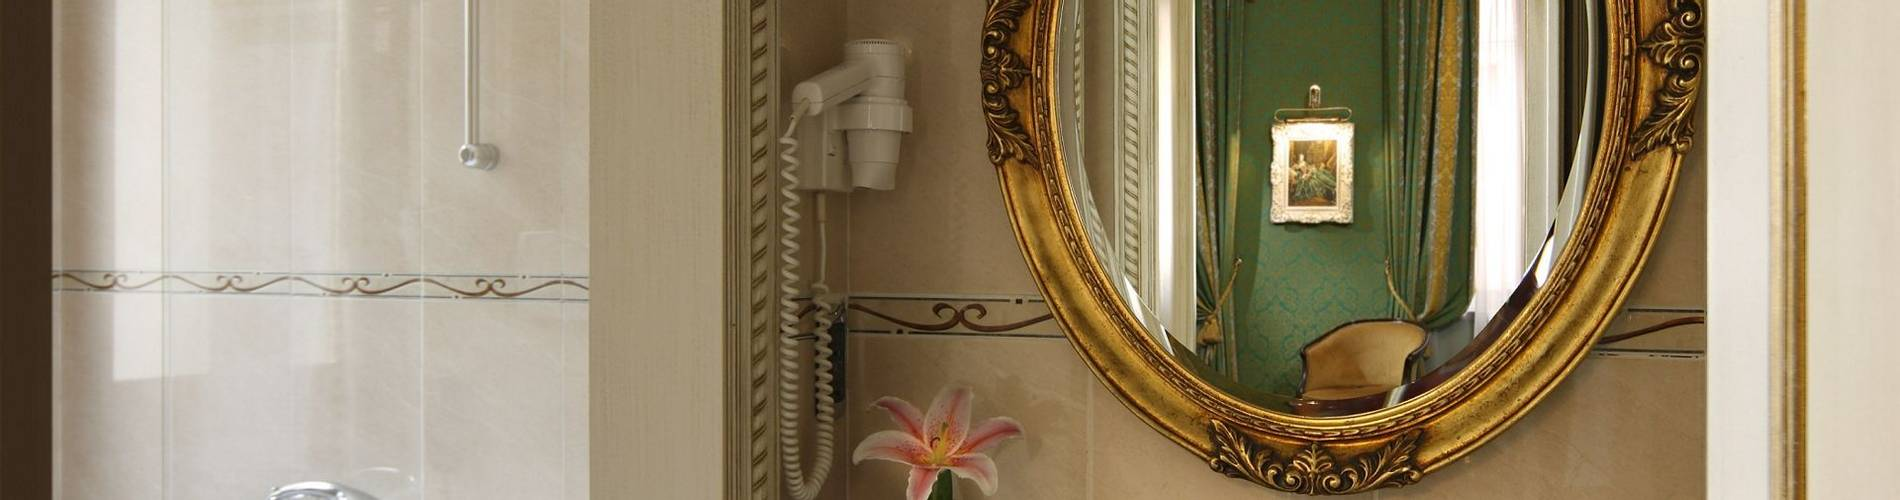 bagno suite.jpg